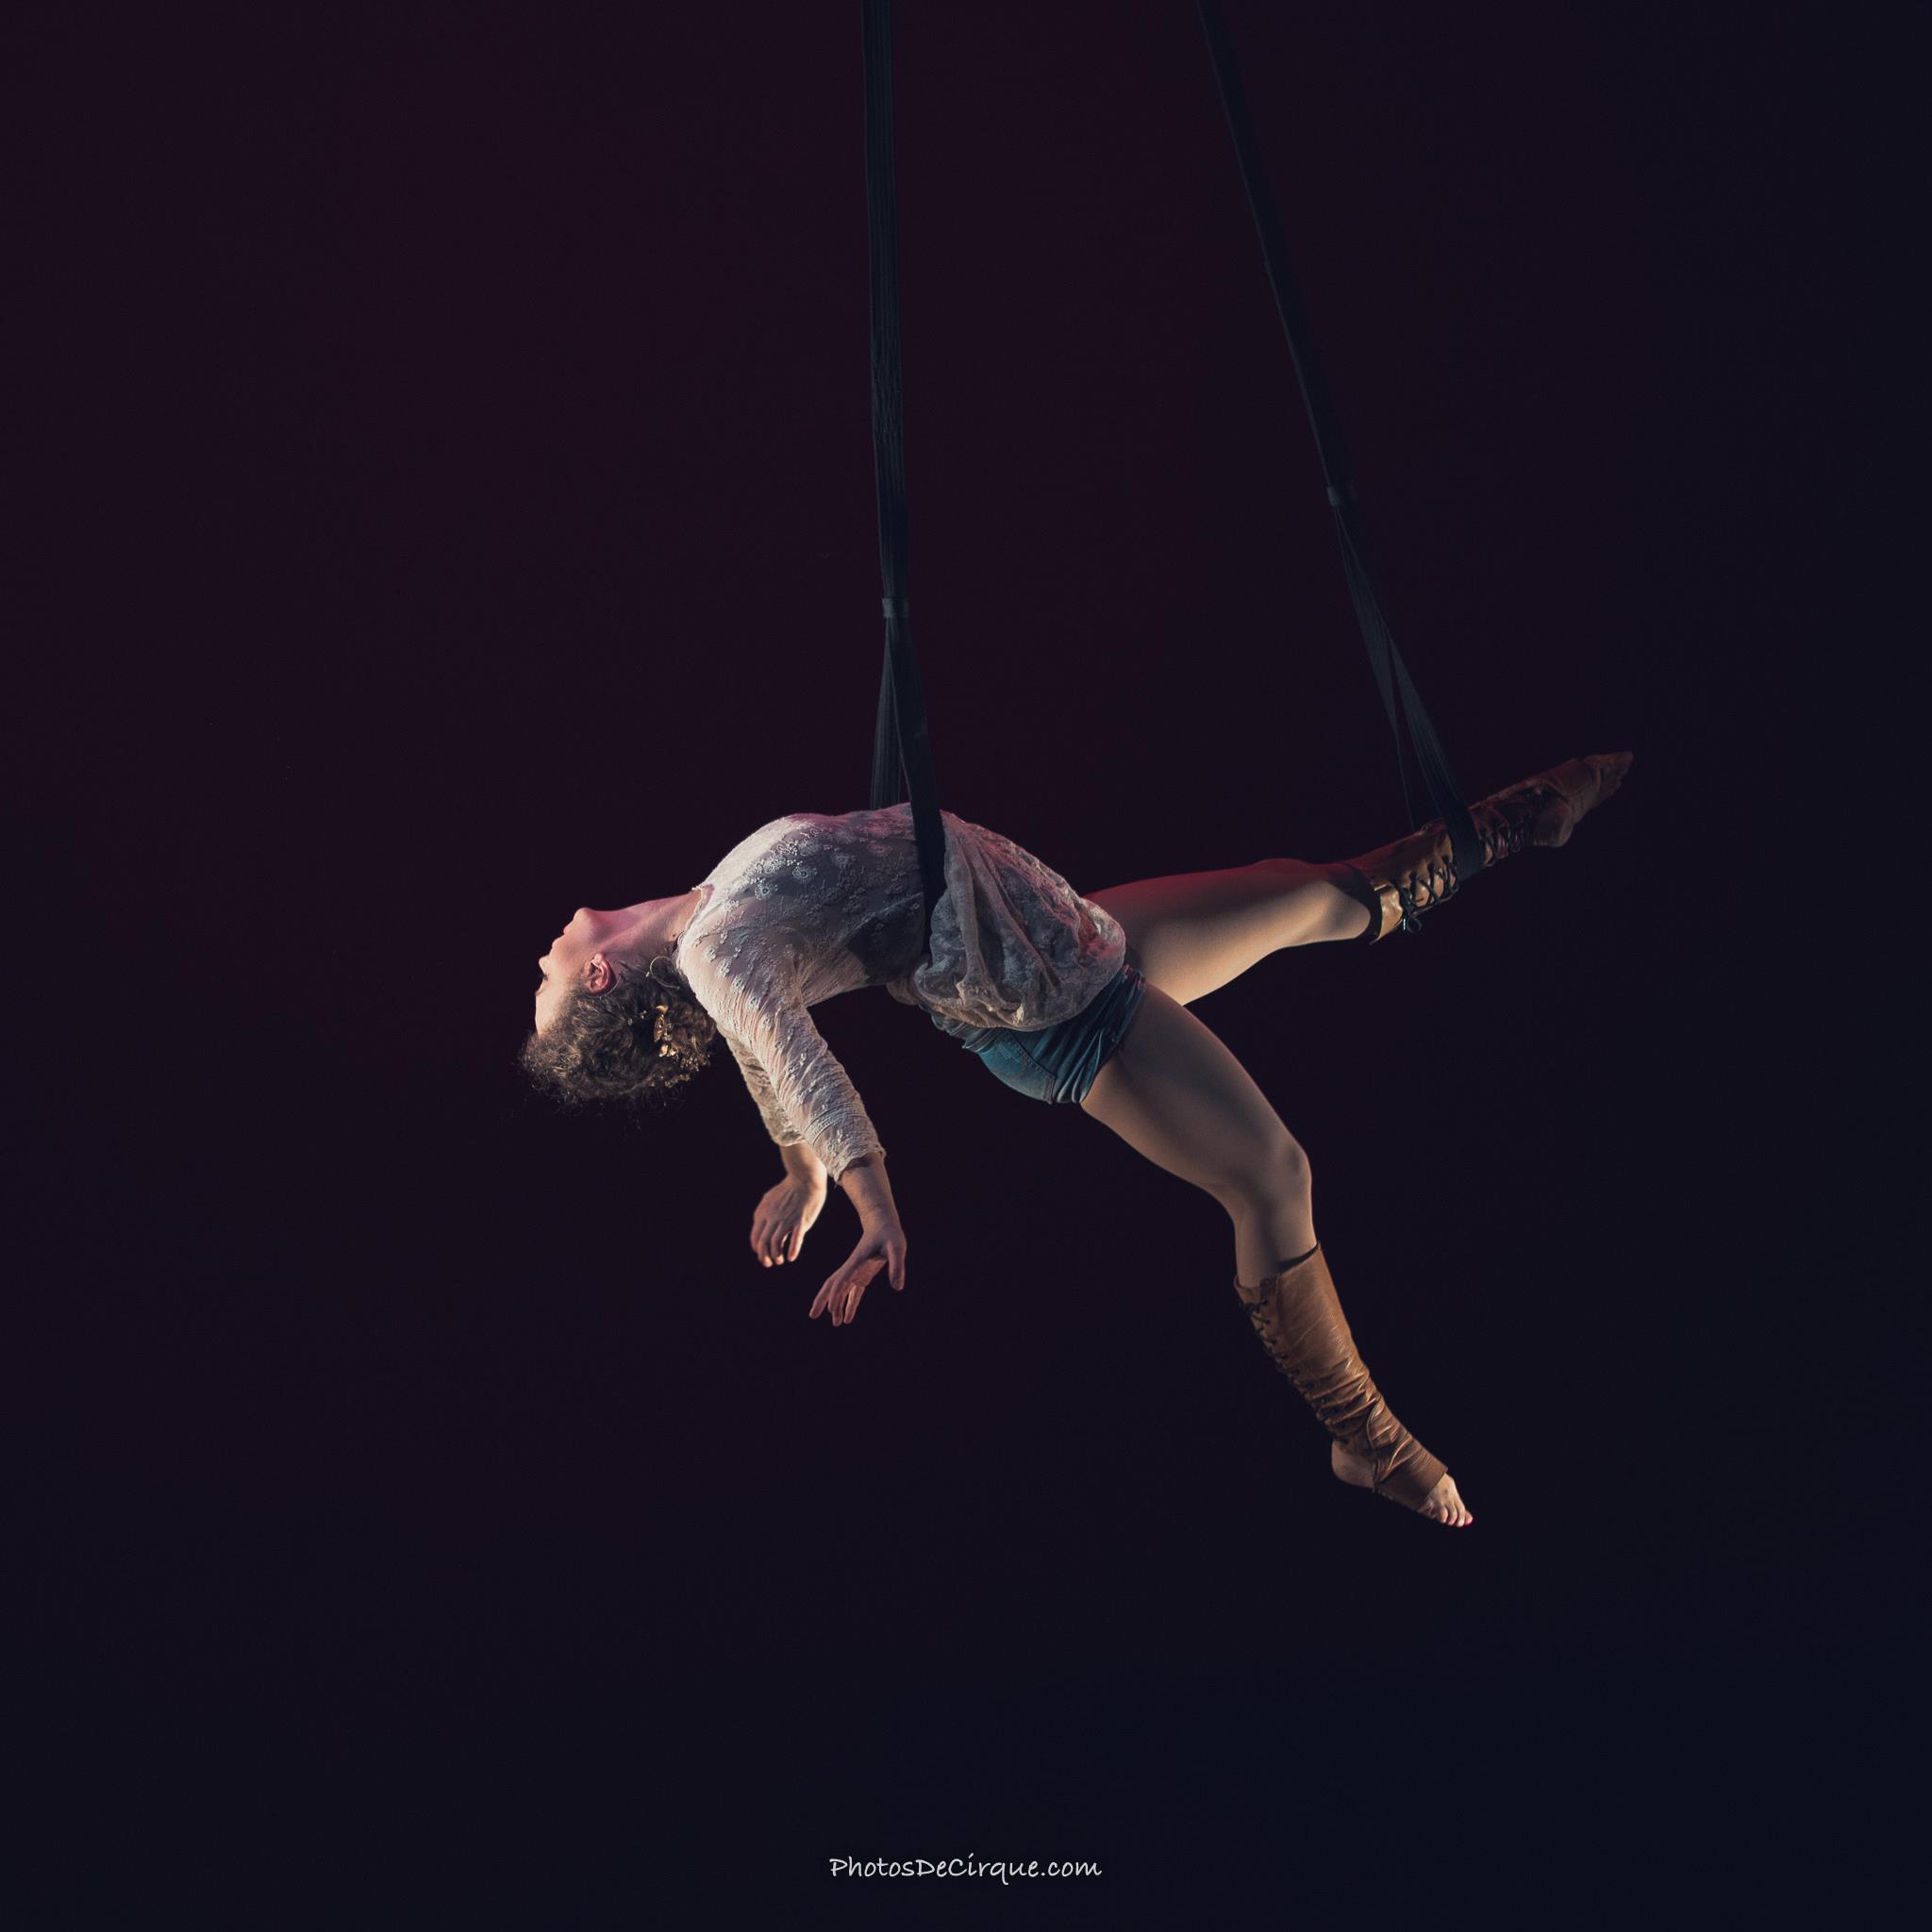 PersephoneBound_4_Leda Davies_PhotoCredit_Jim Mneymneh_aerial_straps_circus_theatre